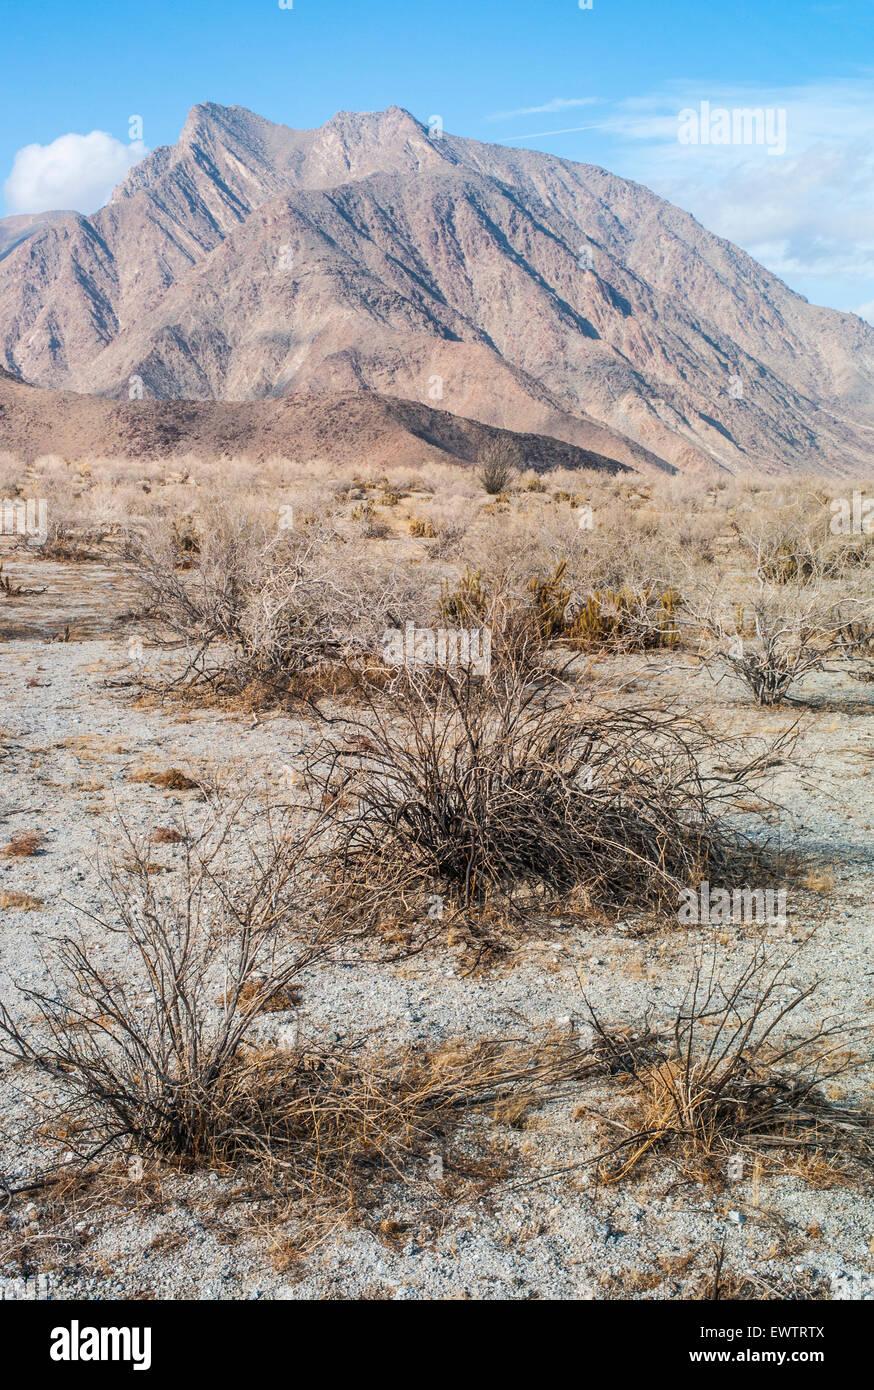 Desert, mountains and blue sky in Anza Borrego National Park, California, USA. - Stock Image